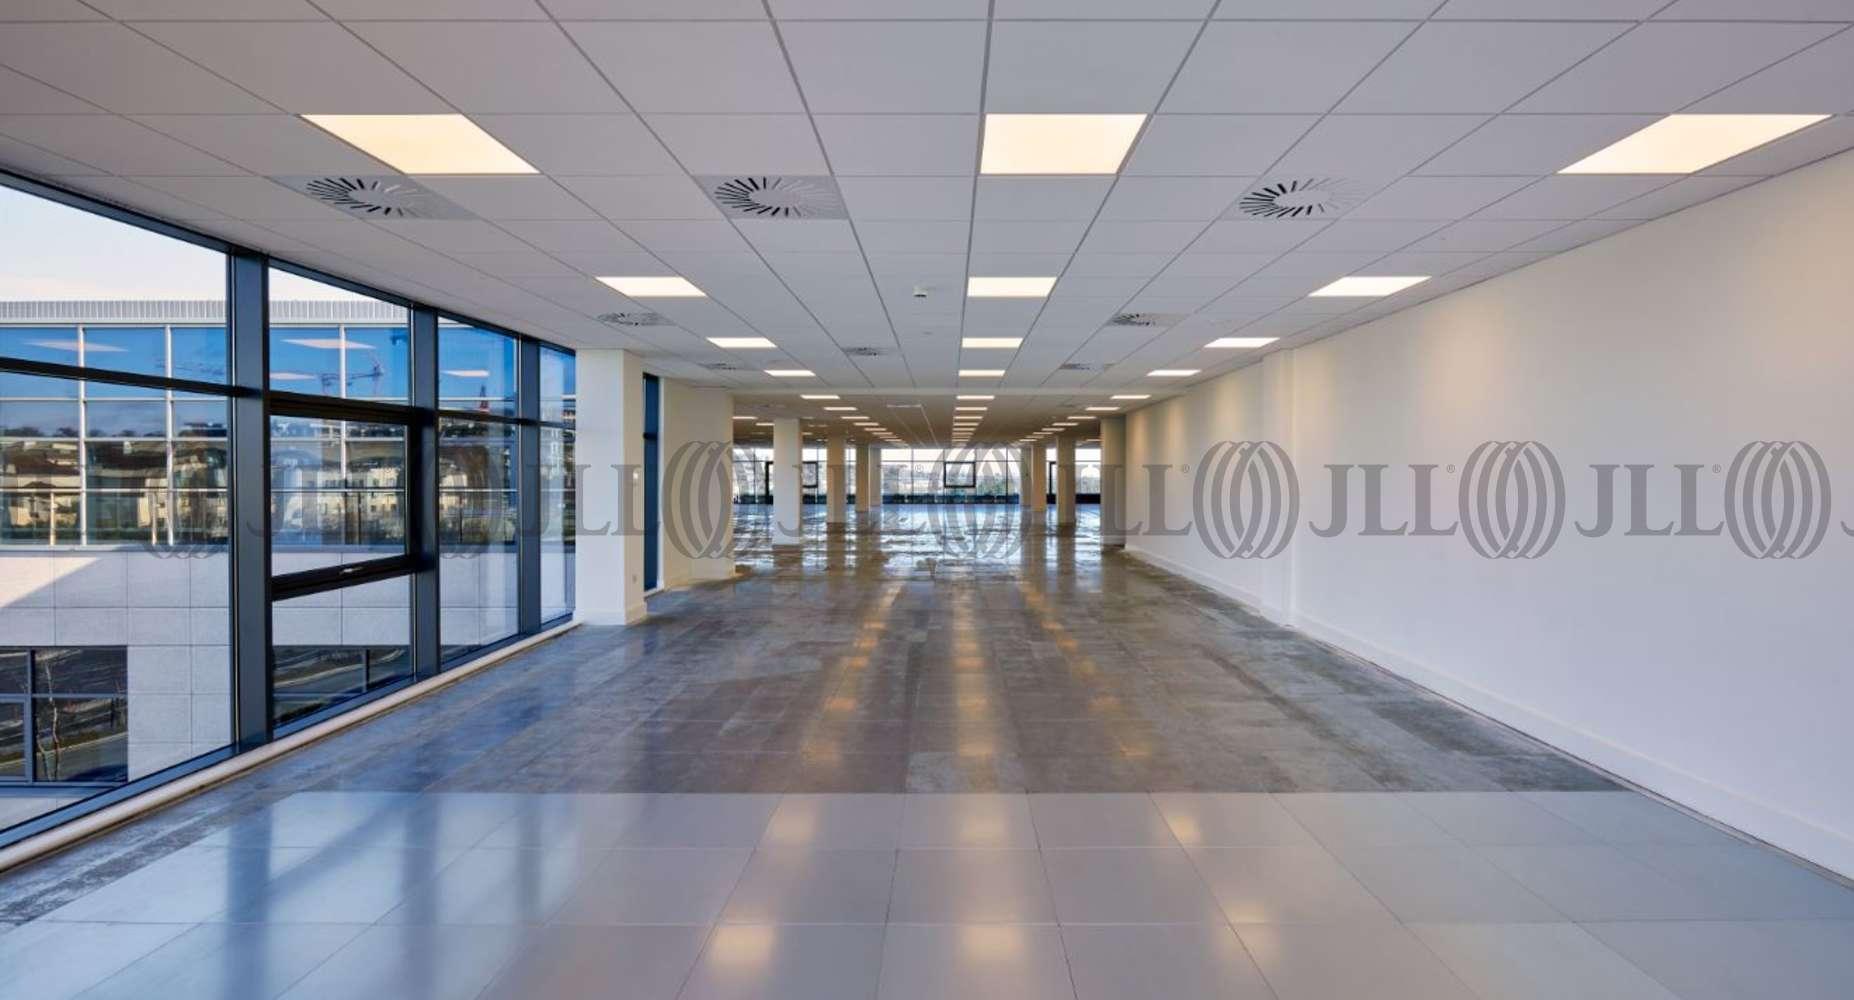 Office Co dublin, D18 TF72 - Part Third Floor, Building 3, The Campus